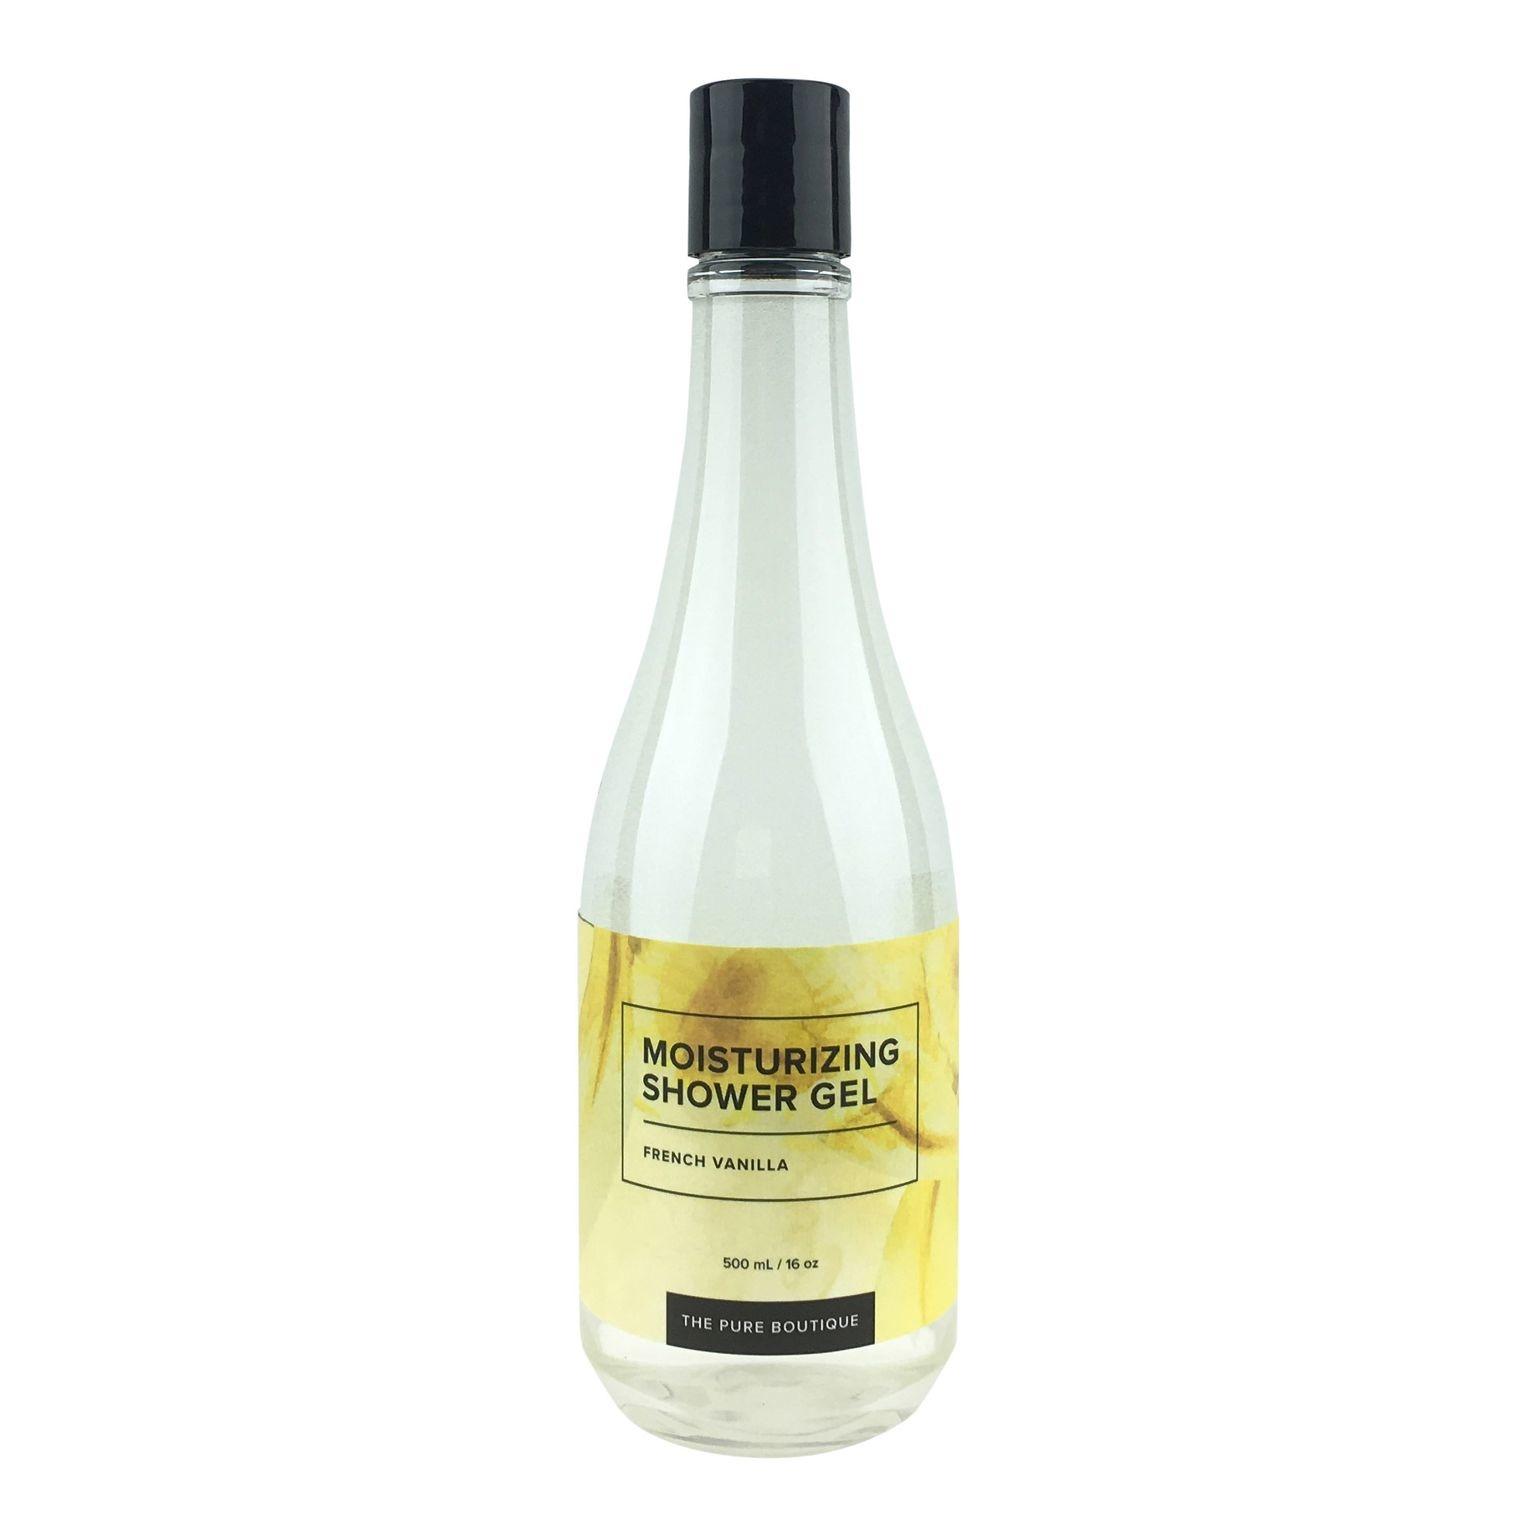 Moisturizing Shower Gel - French Vanilla-1